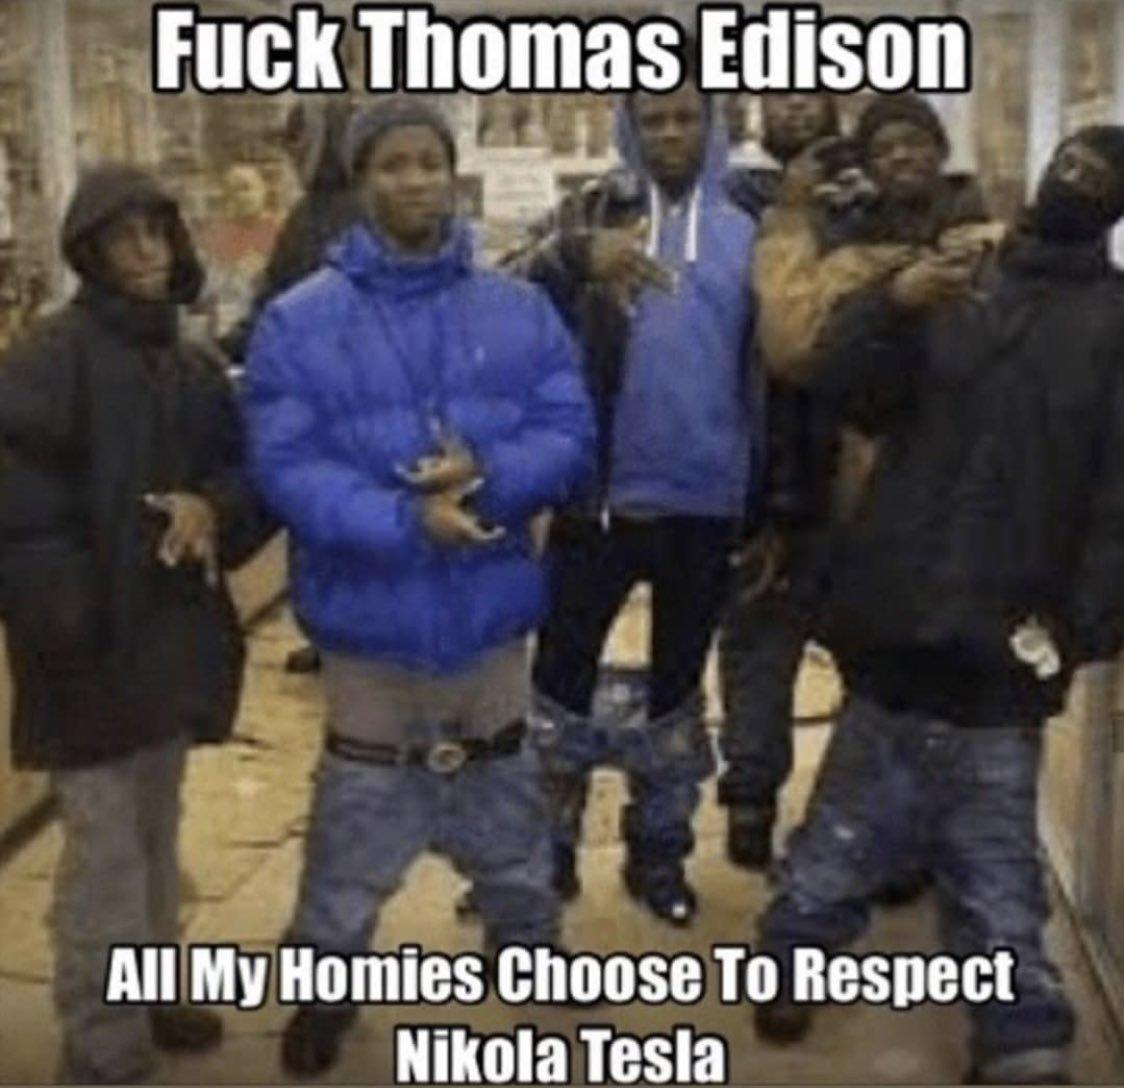 Fuck you Thomas - meme